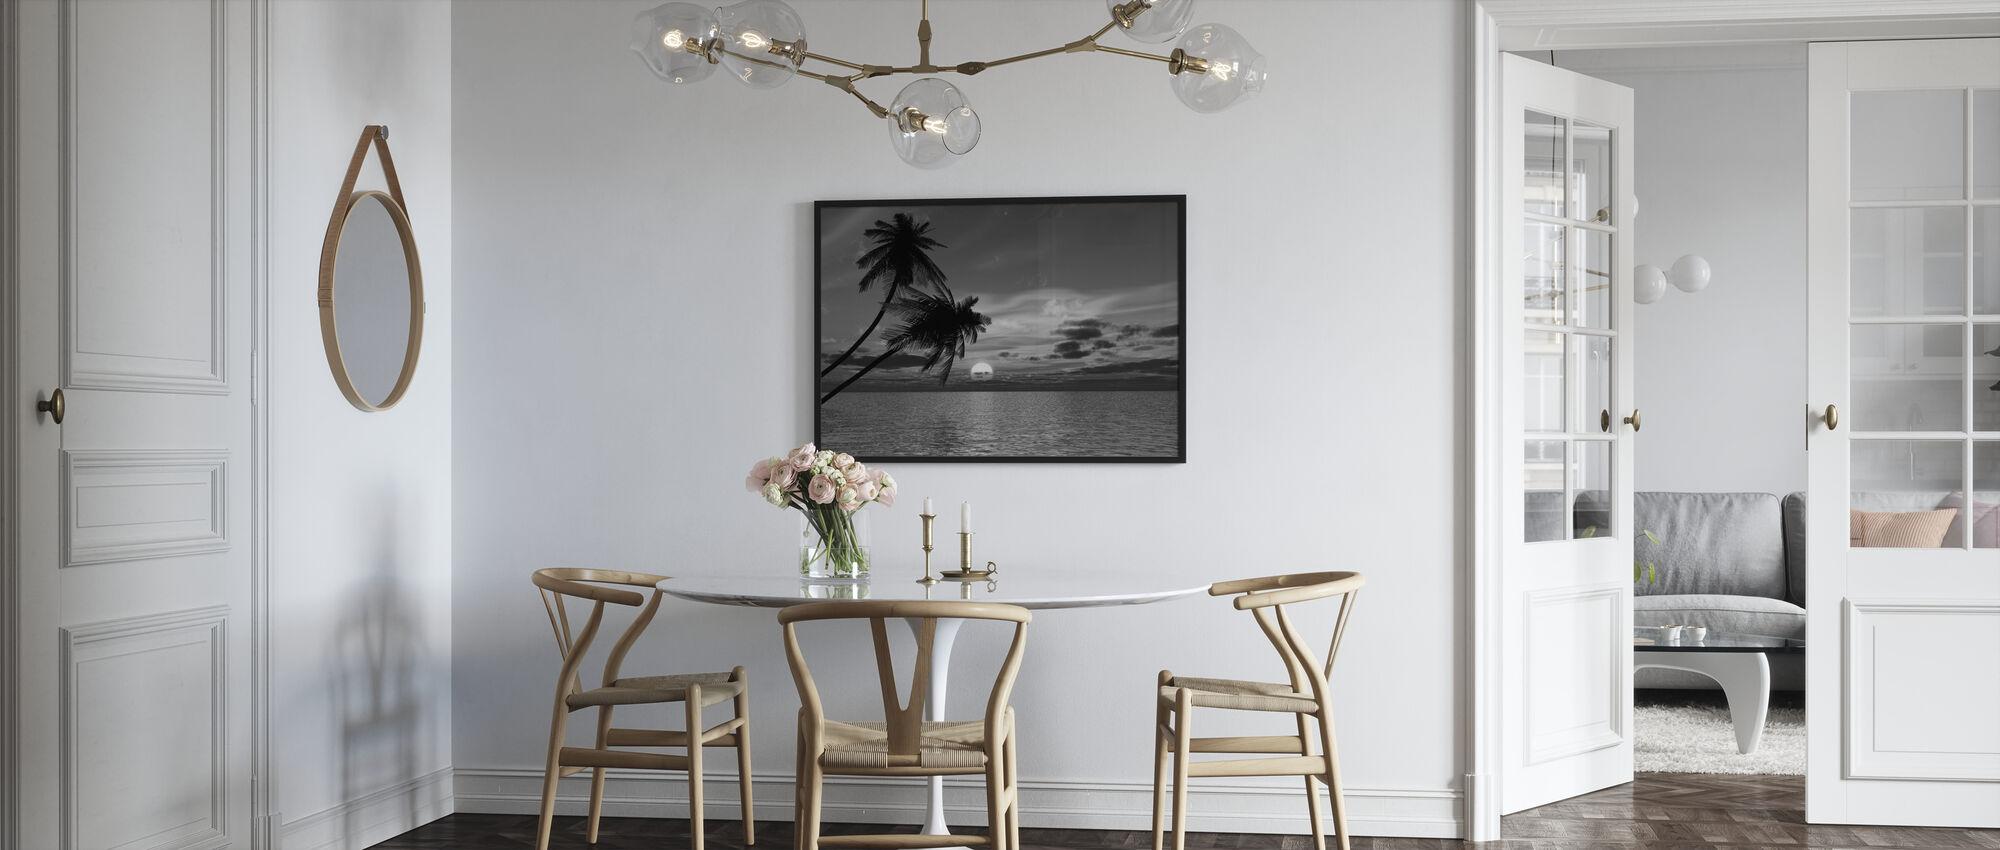 Kokospalme Sonne - Poster - Küchen